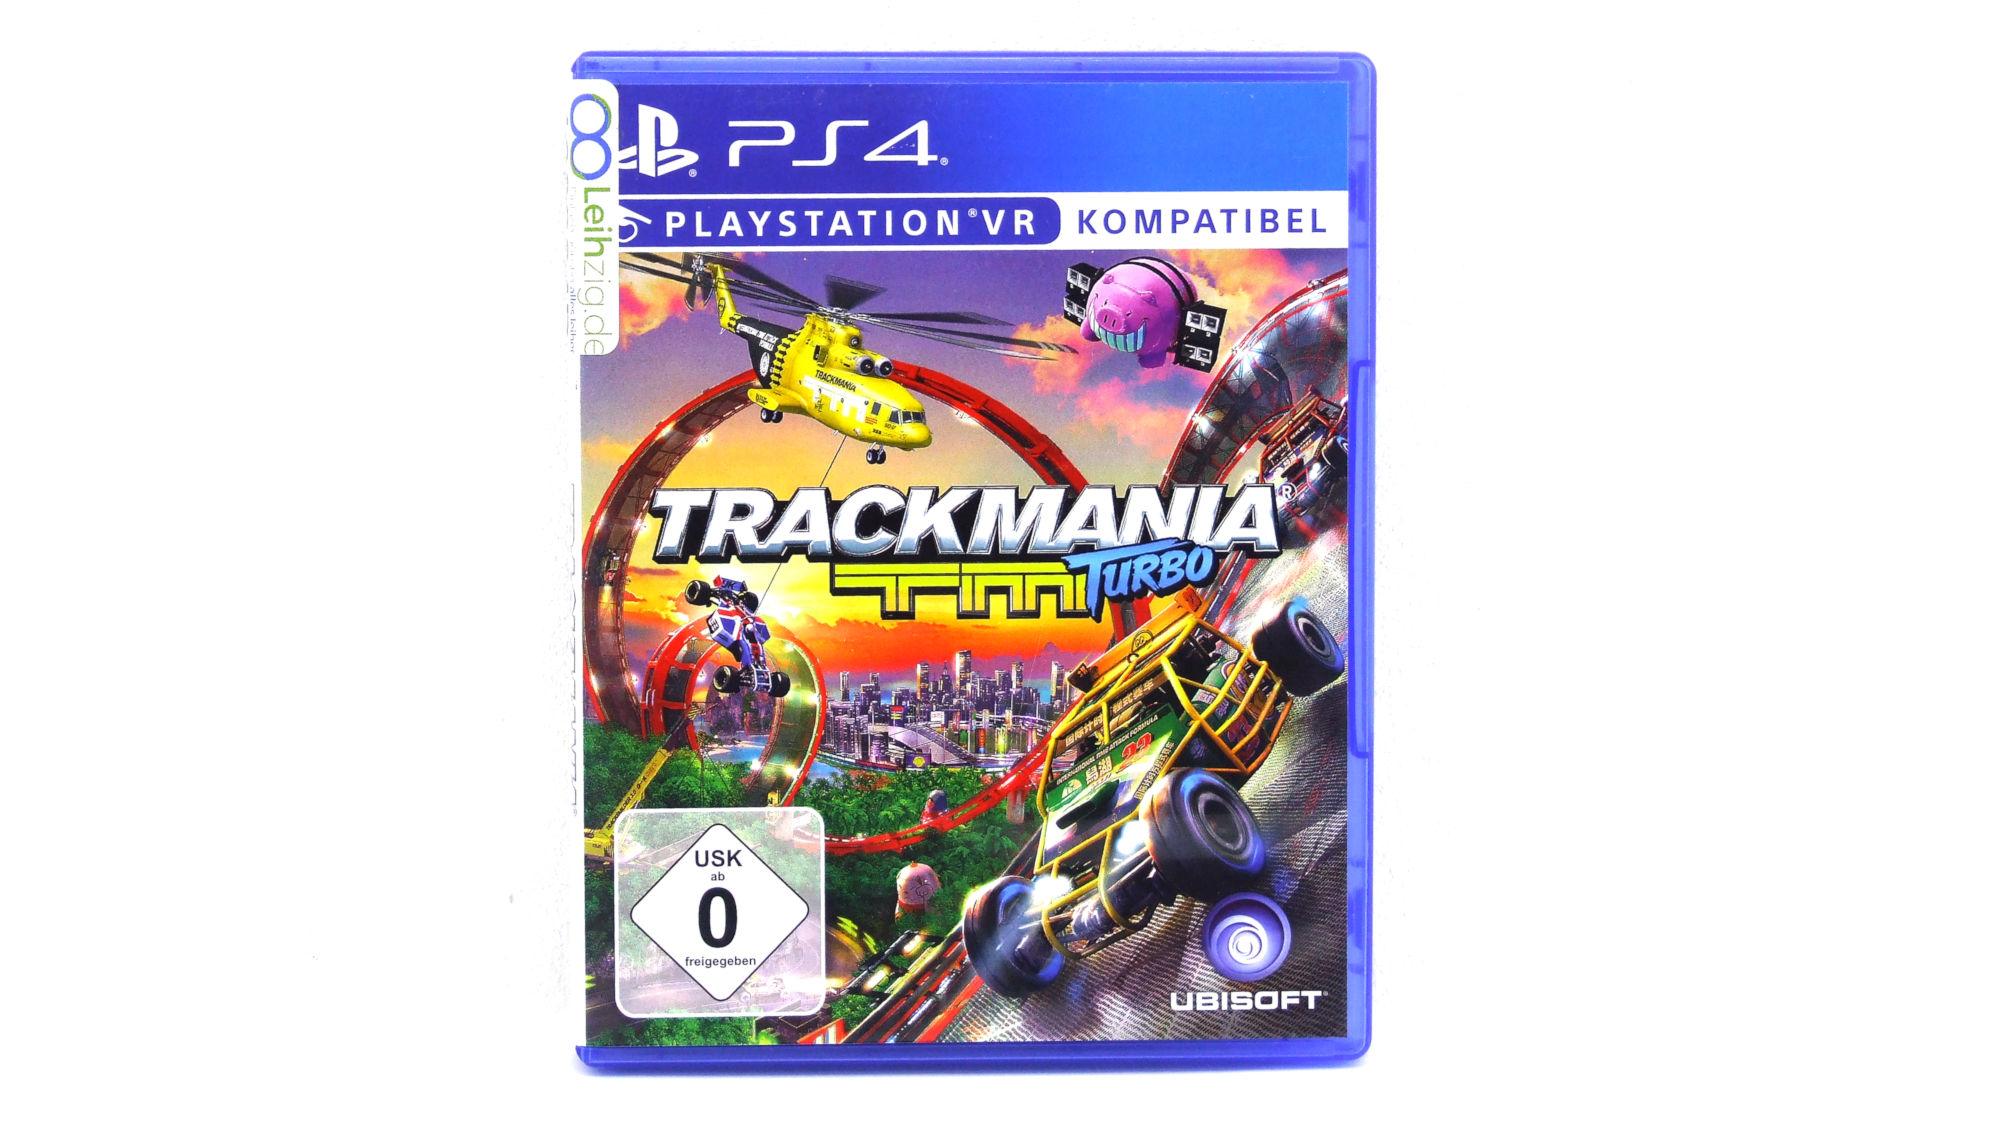 Spiel: Trackmania Turbo leihen